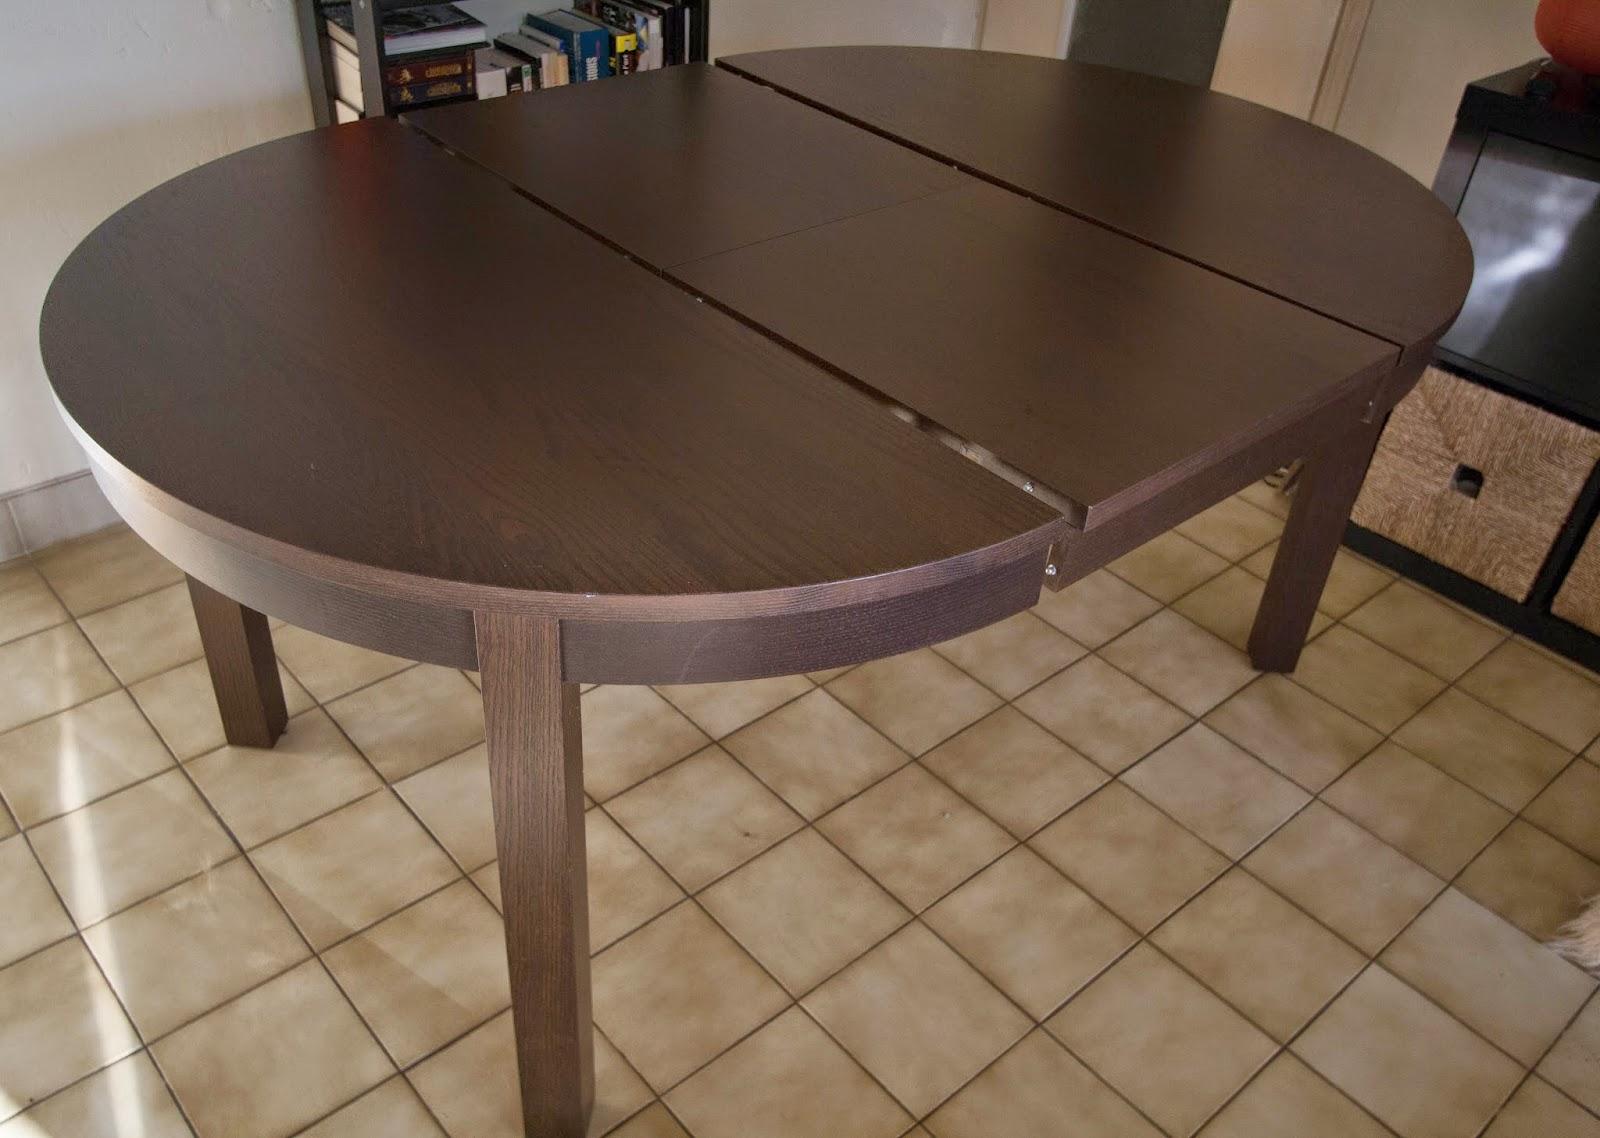 Marion decore diy relooker sa table de salle manger - Repeindre un meuble melamine ...